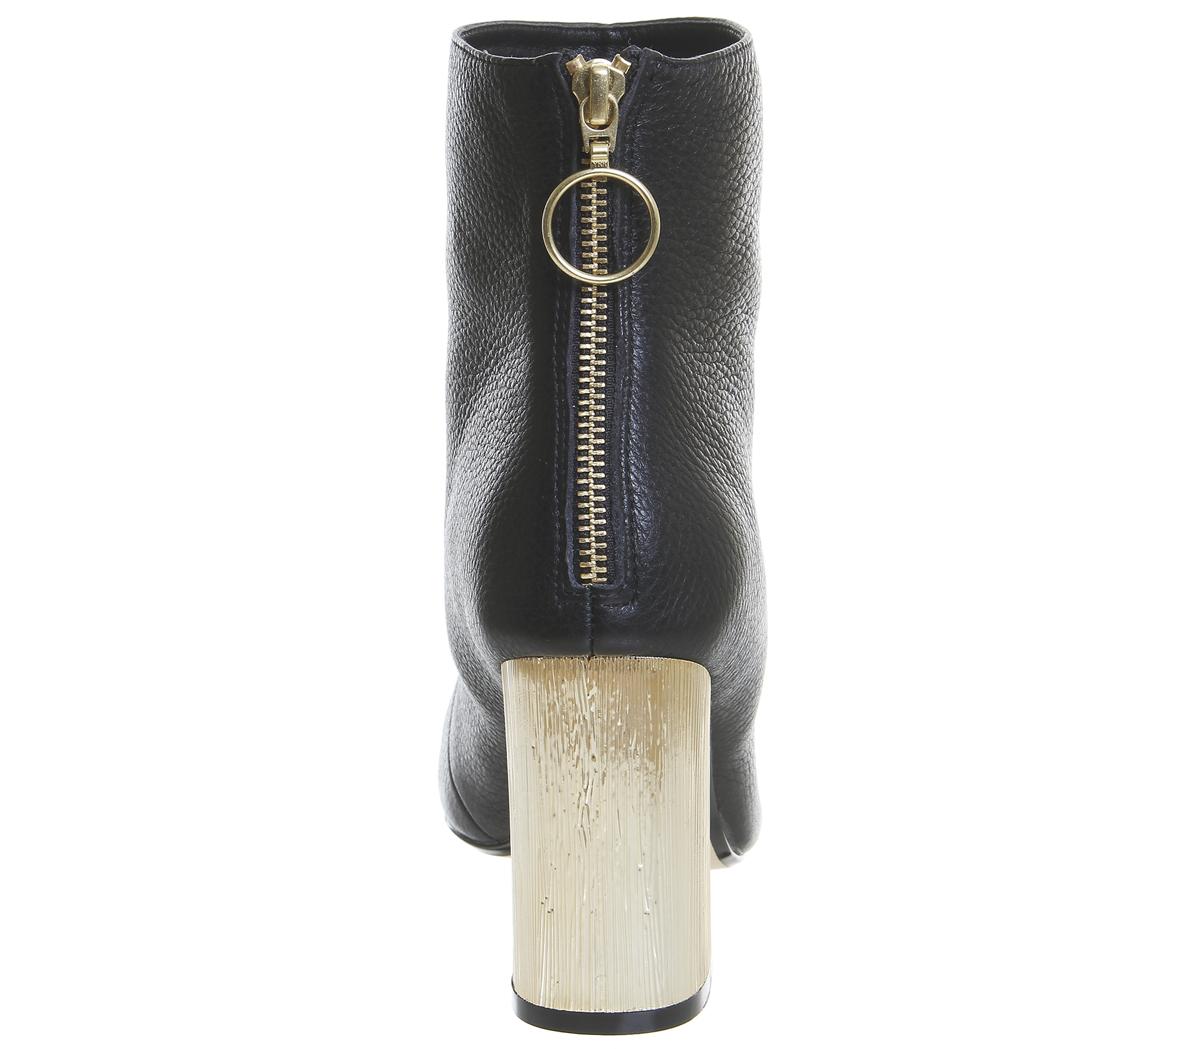 Damen Office Alaska Blockabsatz Schwarz Knöchelhohe Stiefel Schwarz Blockabsatz Leder Gold Absatz 79548e